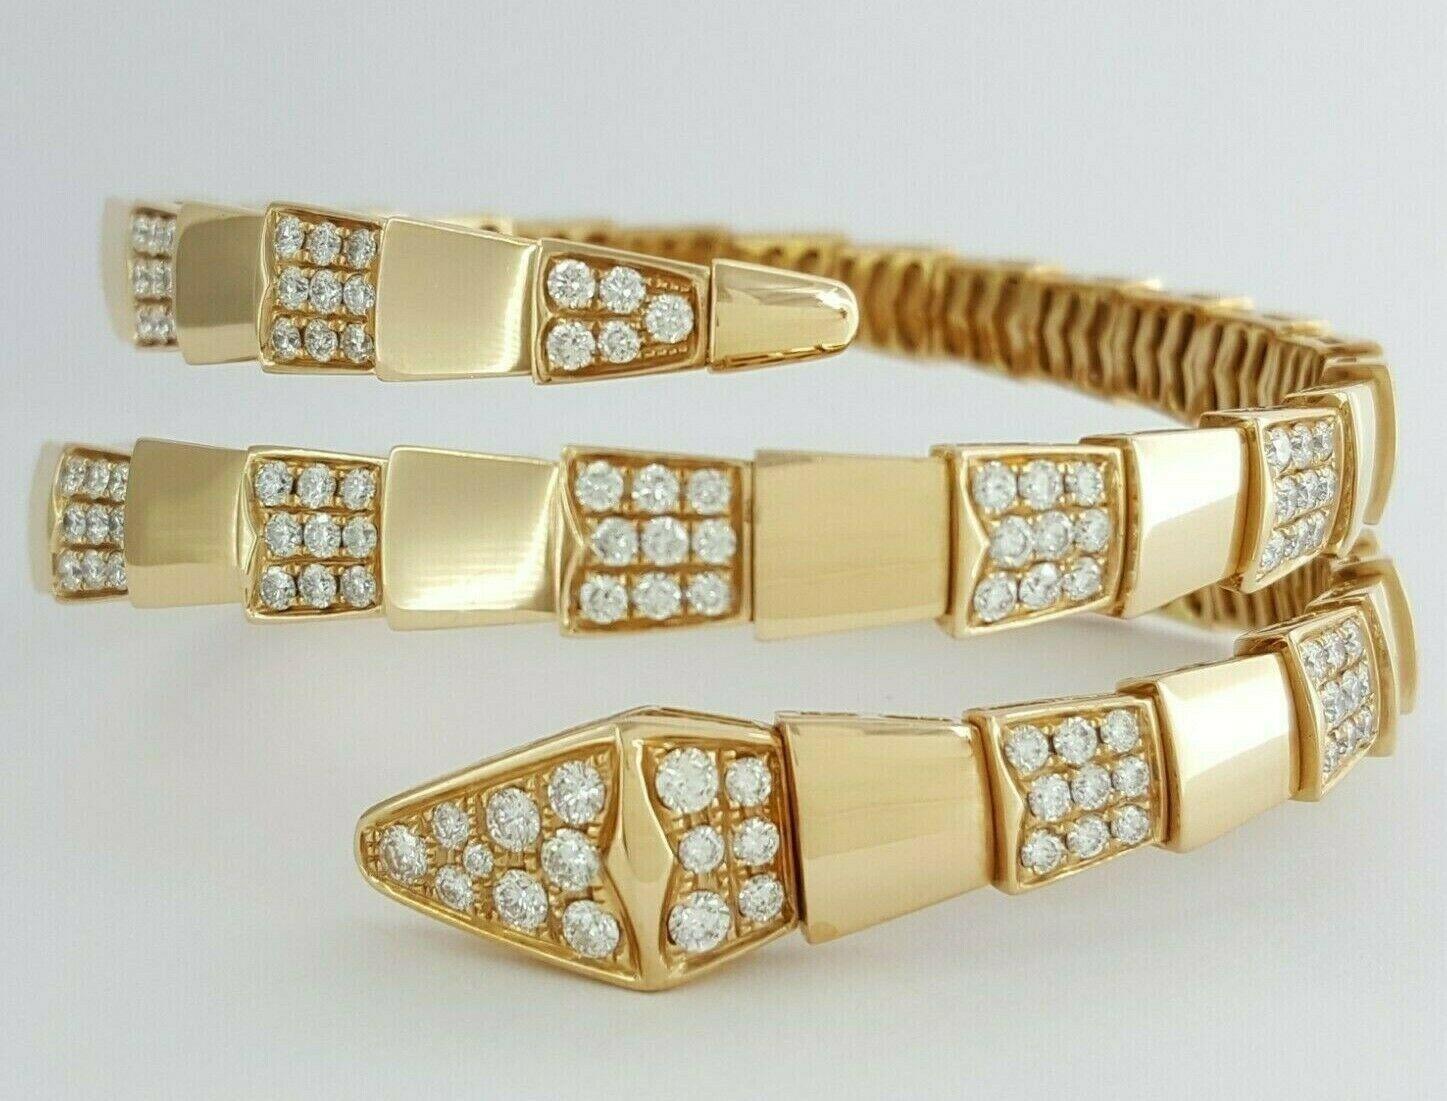 Serpenti Viper Snake Two Row Pave 6 ct Round Diamond Bracelet 18k pink gold 65gm